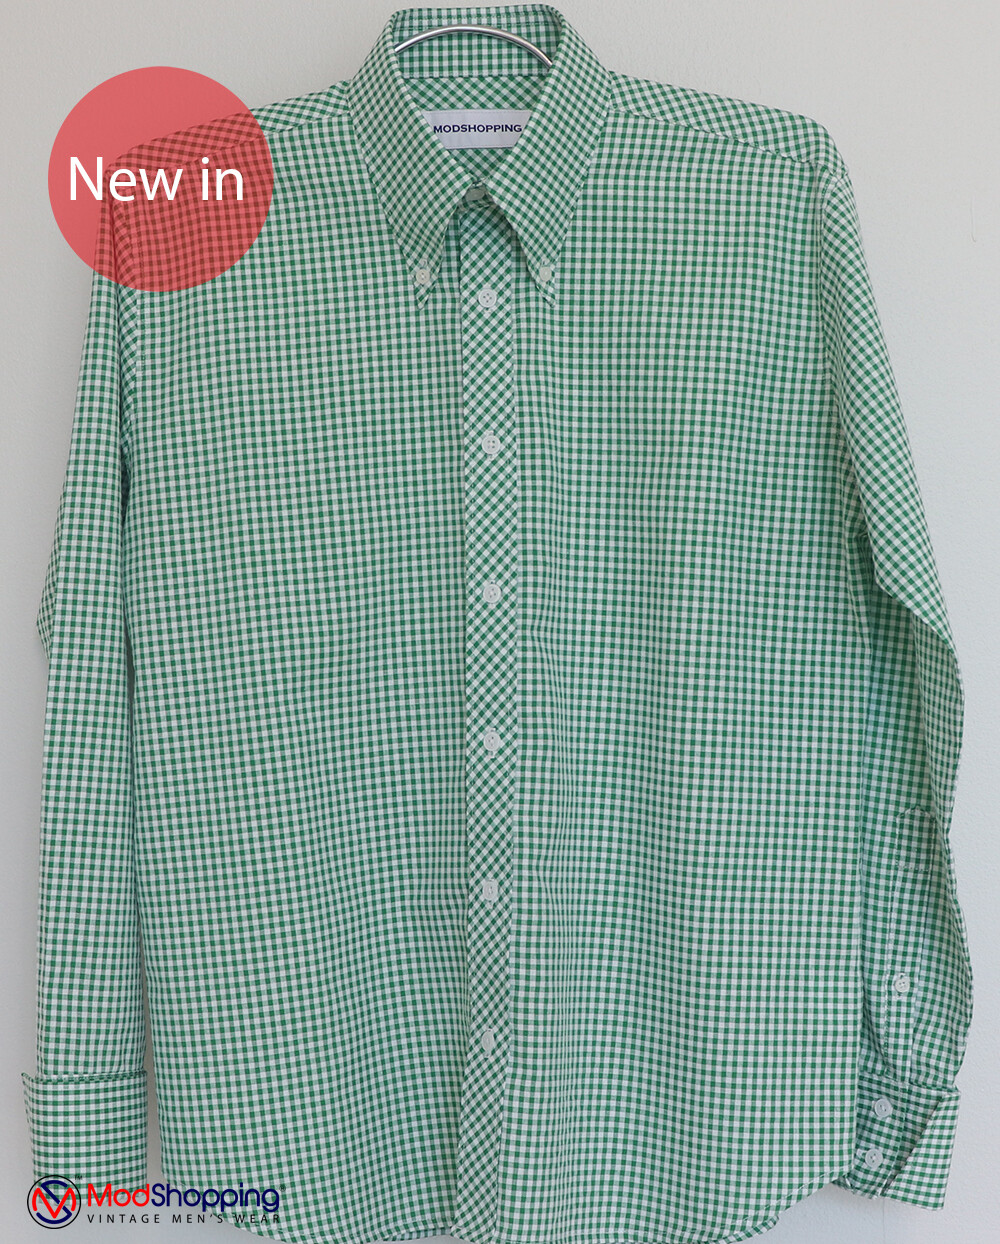 Green Gingham Shirt|Green Long Sleeve Gingham Shirt Uk